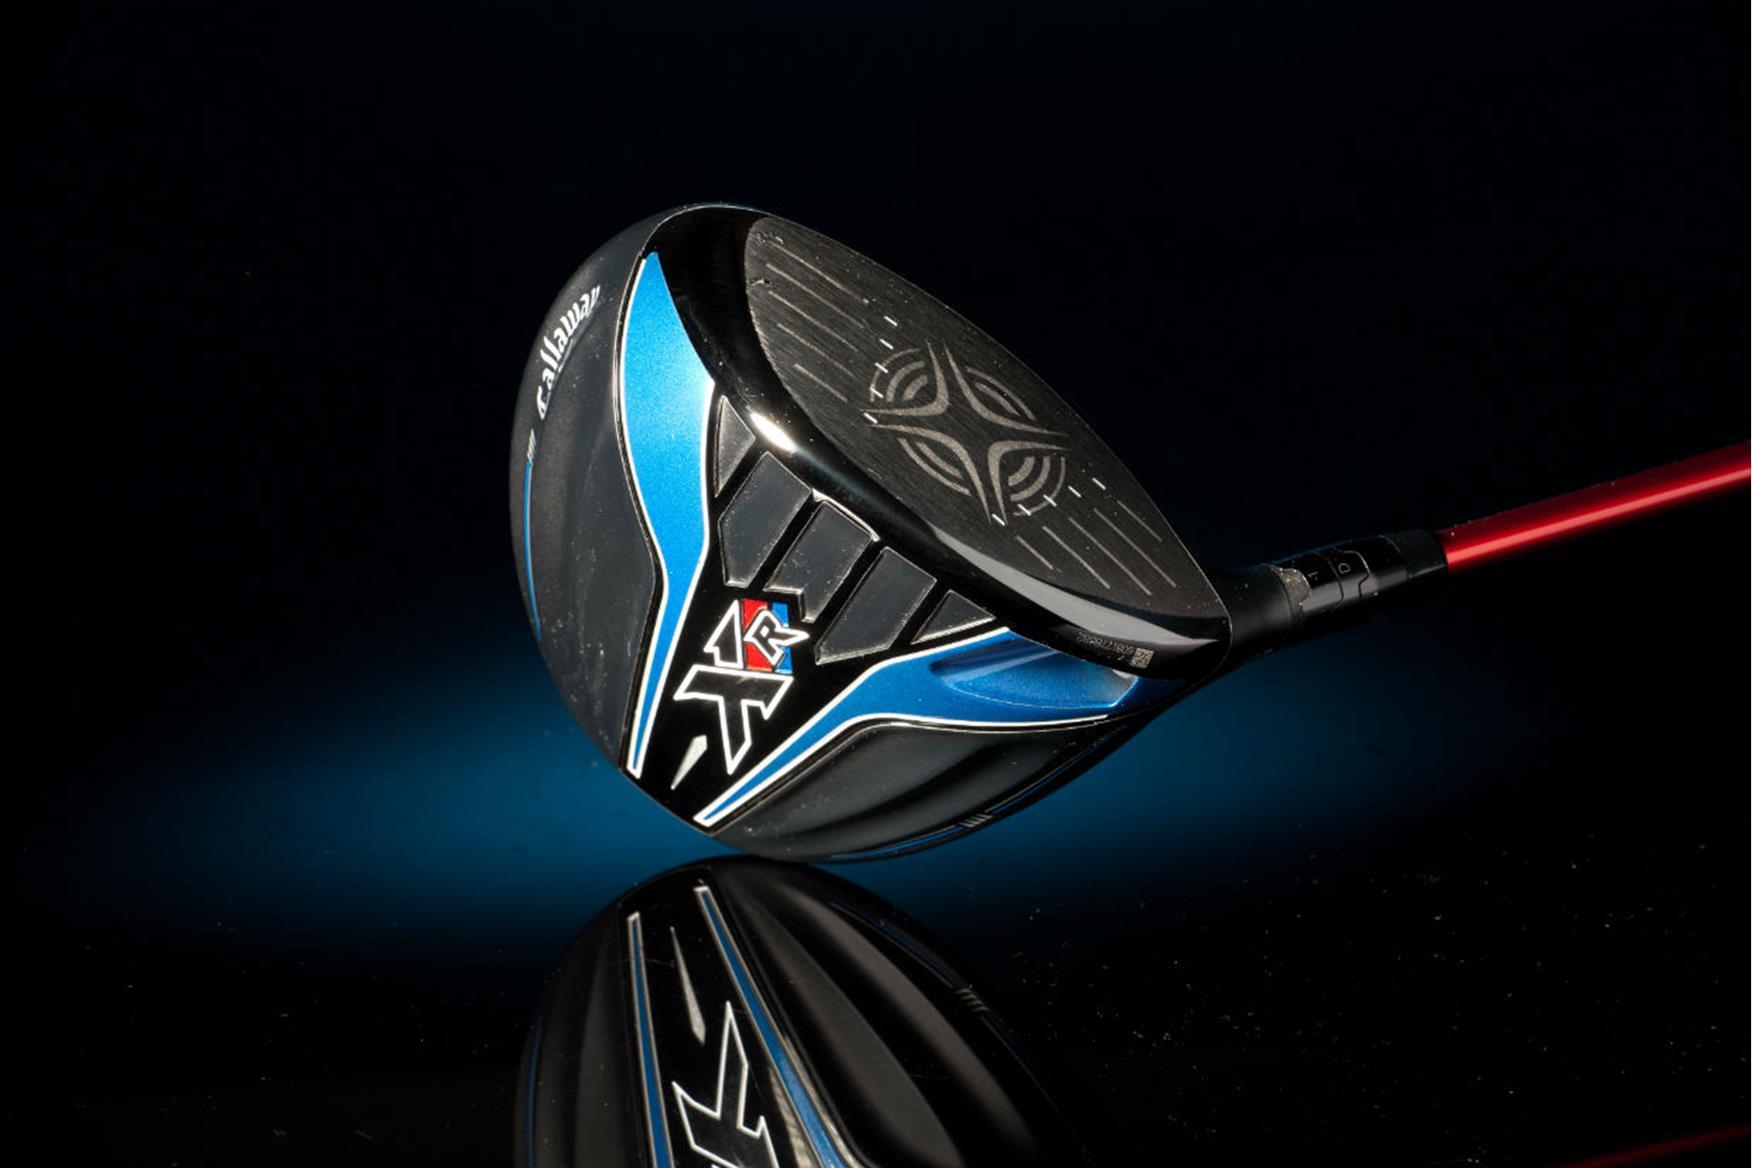 Callaway Xr16 Driver Review Equipment Reviews Todays Golfer